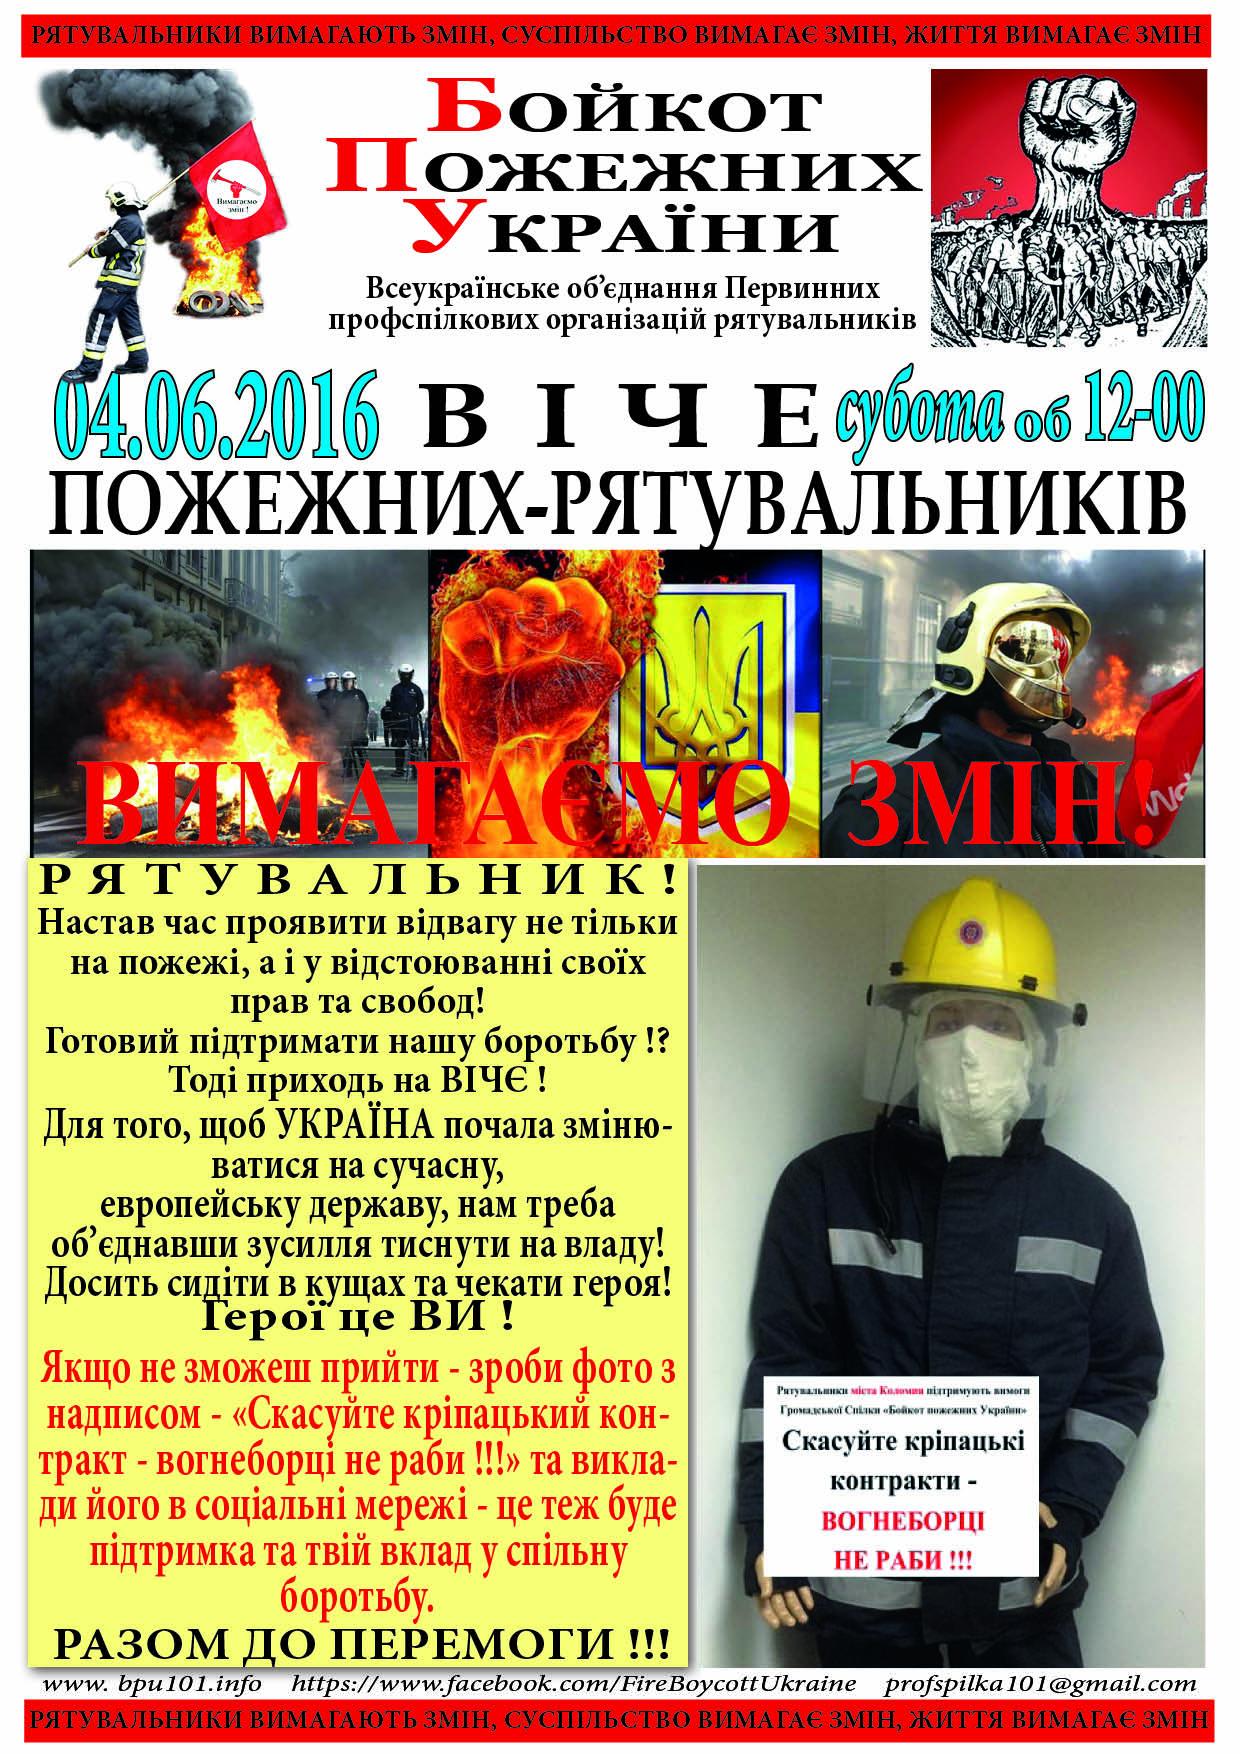 http://s0.uploads.ru/cPNgv.jpg